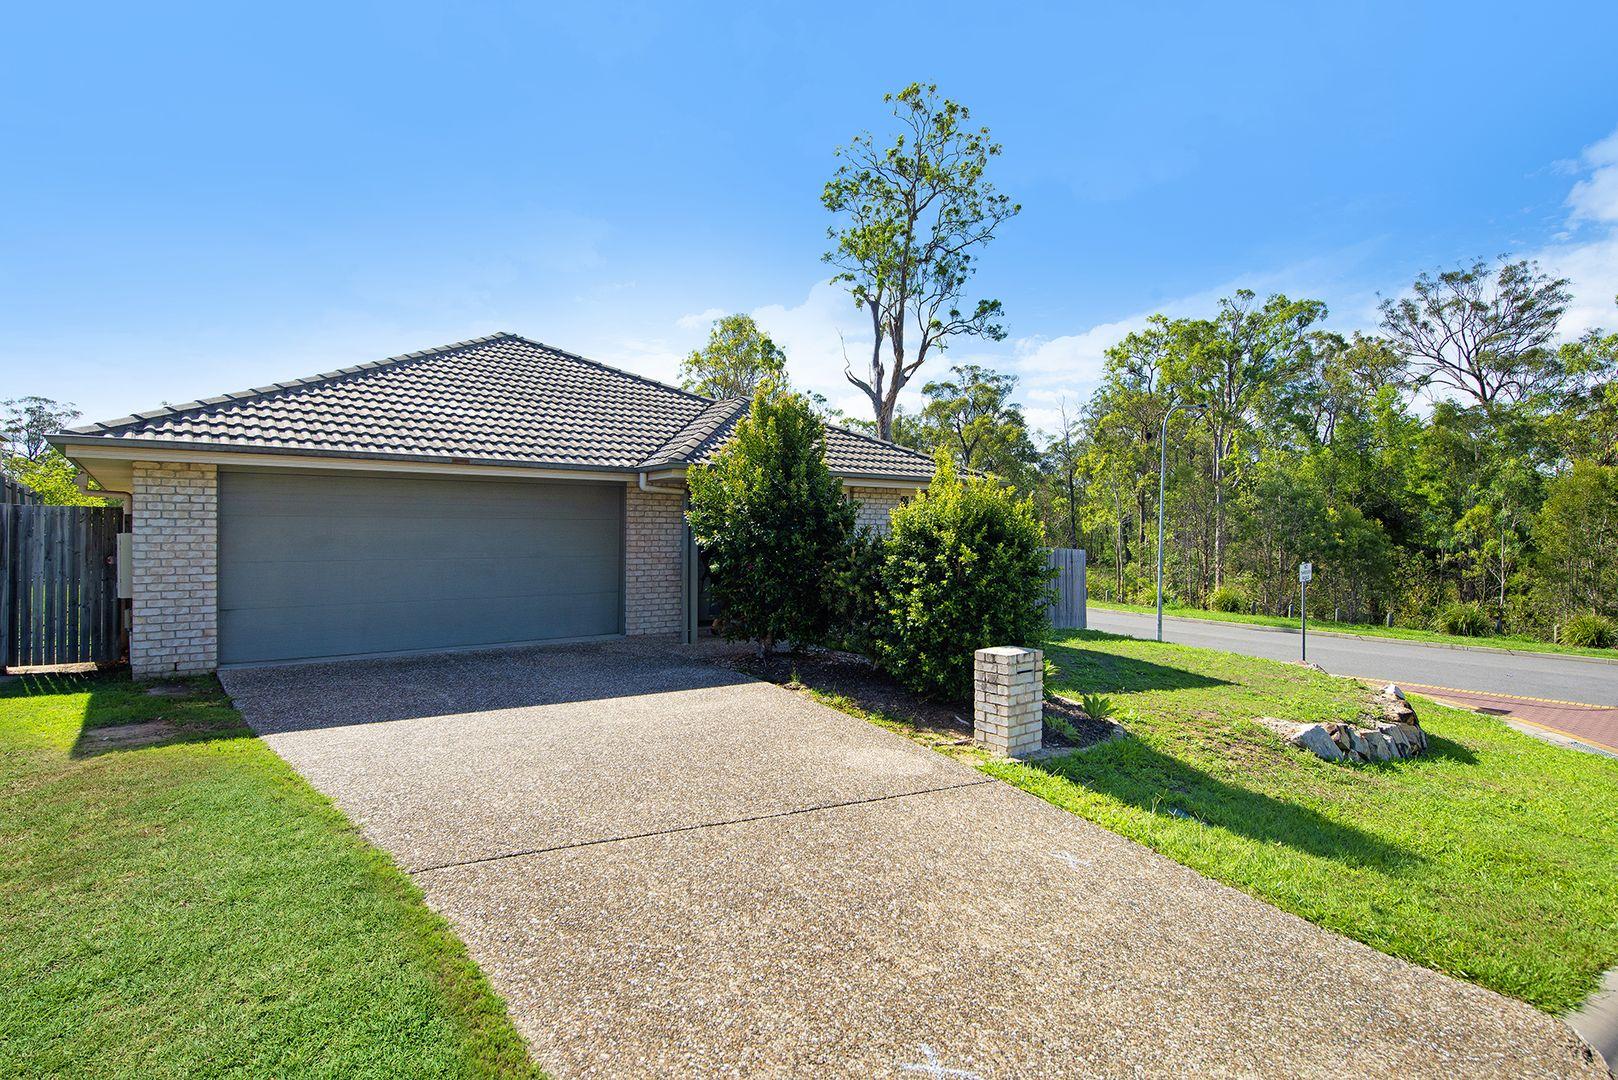 1 Brendan Thorne Place, Marsden QLD 4132, Image 0